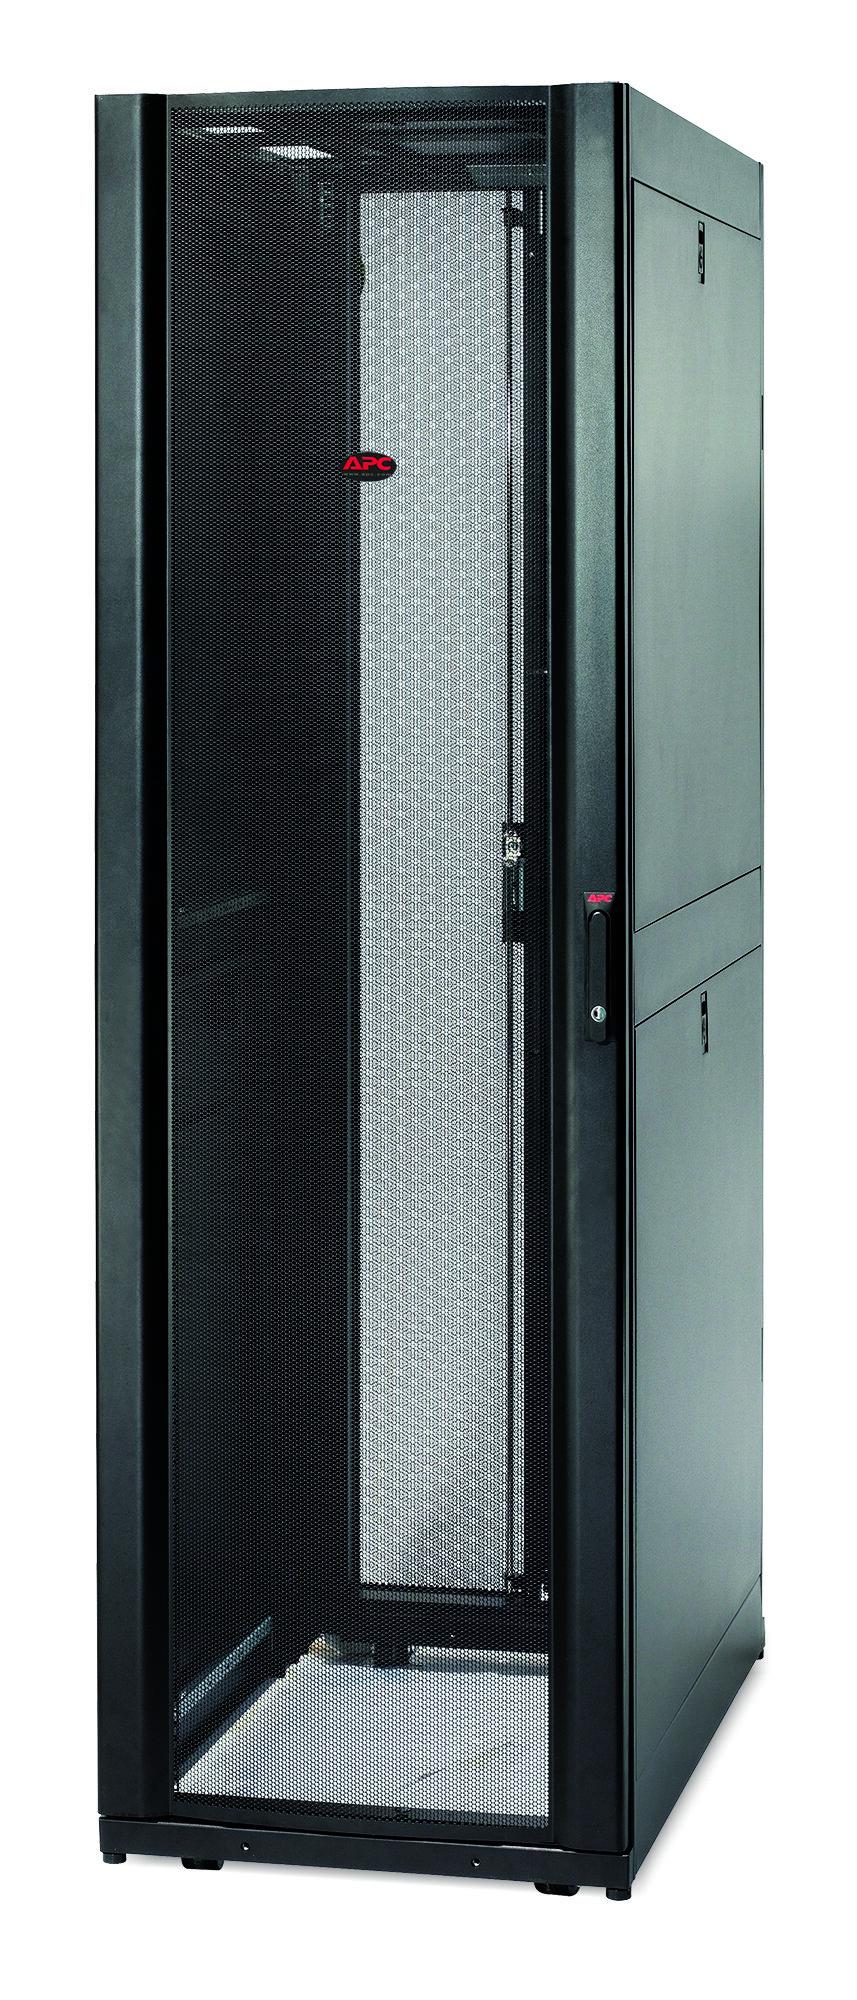 Cabinet Rack Server, APC Netshelter SX , AR 3300, 42U , 1991 mm x 600 mm x 1200 mm - imaginea 1